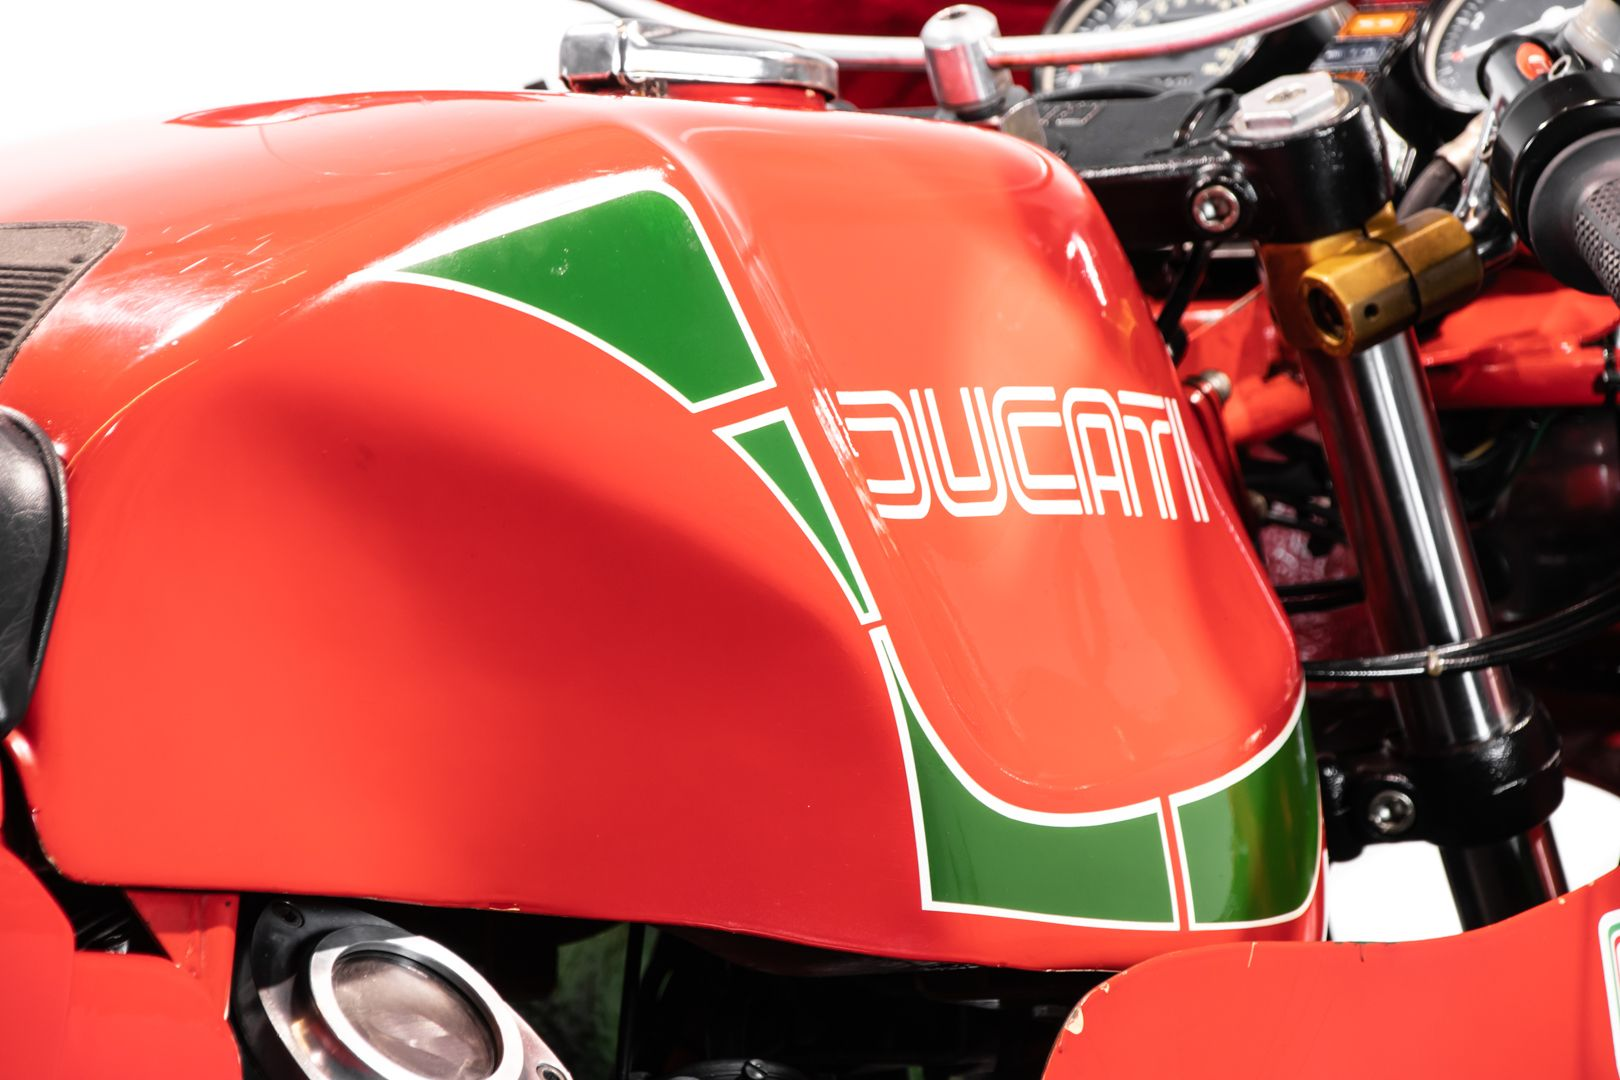 1983 Ducati 900 Mike Hailwood Replica 71420